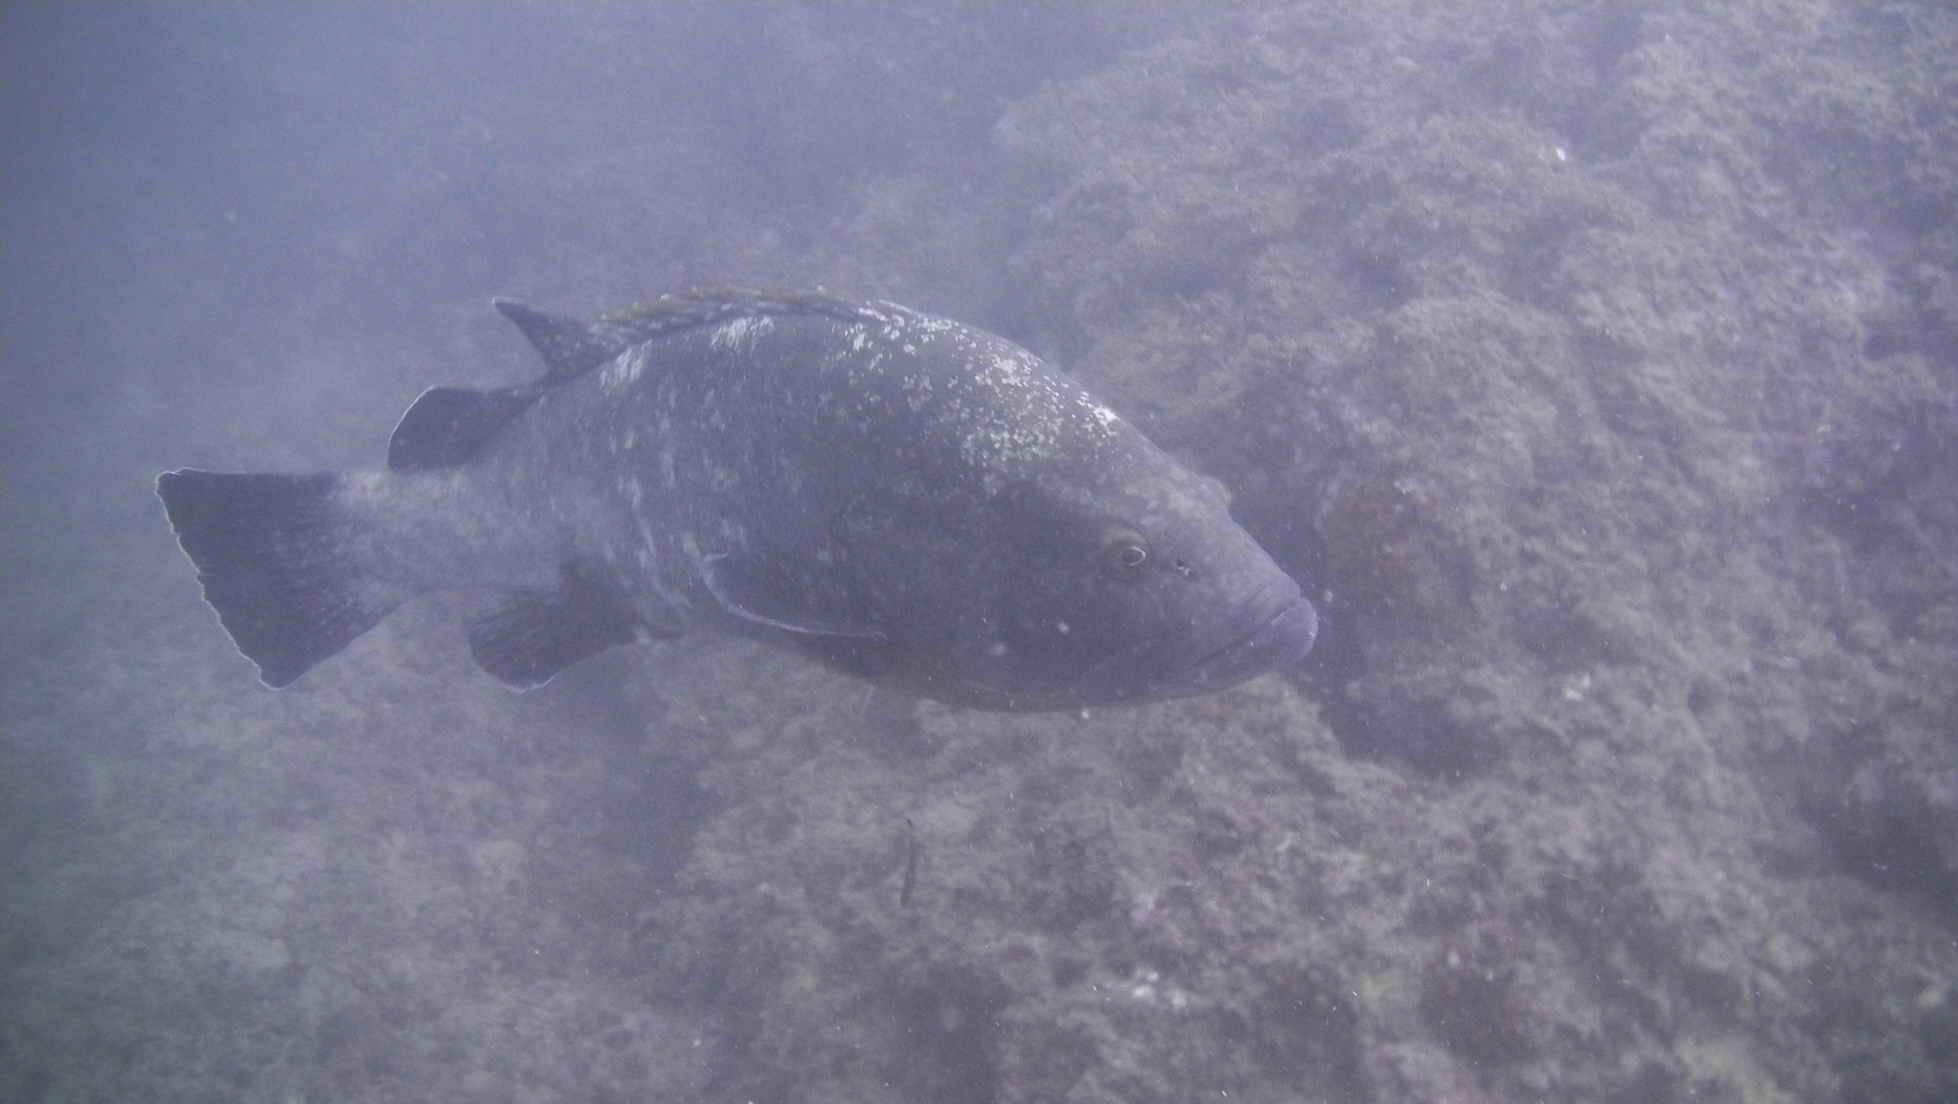 Viaje de buceo fin de semana vida a bordo reserva Islas COLUMBRETES 19-21 julio